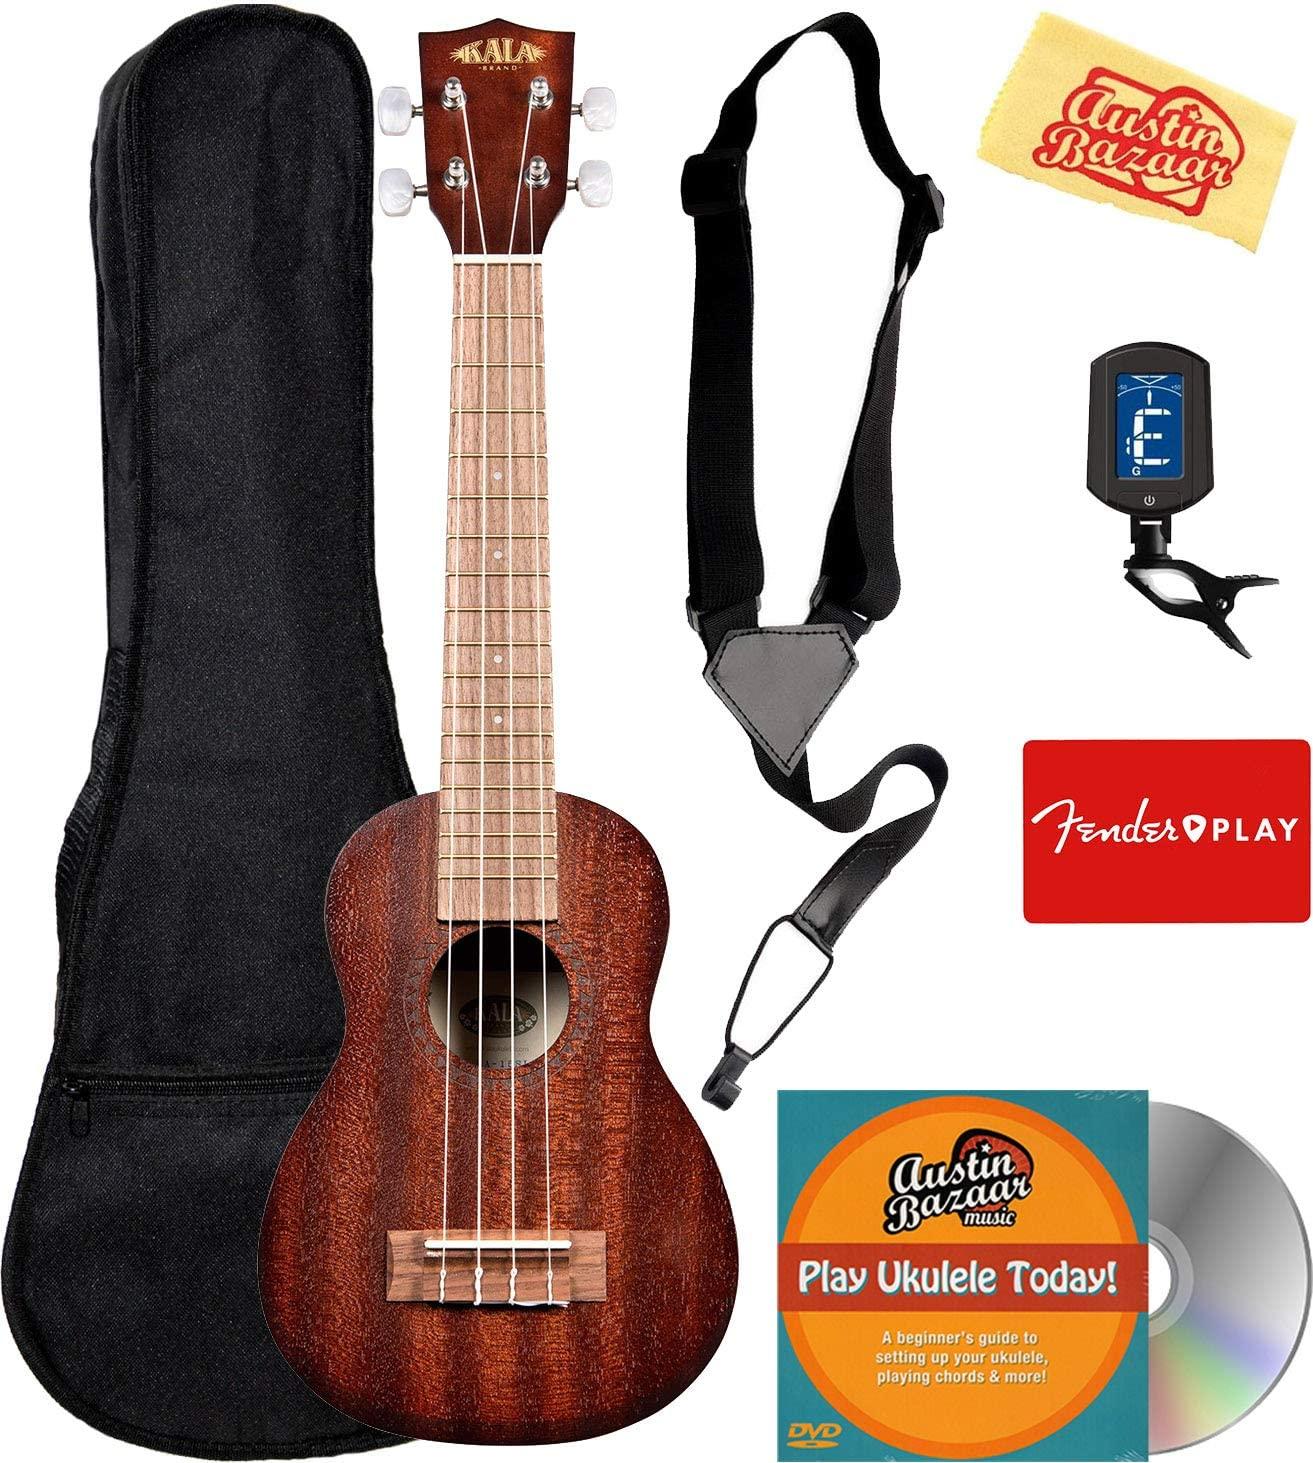 Kala KA-15SLNG Satin Mahogany Long Neck Soprano Ukulele Bundle with Gig Bag, Tuner, Strap, Fender Play Online Lessons, Austin Bazaar Instructional DVD, and Polishing Cloth